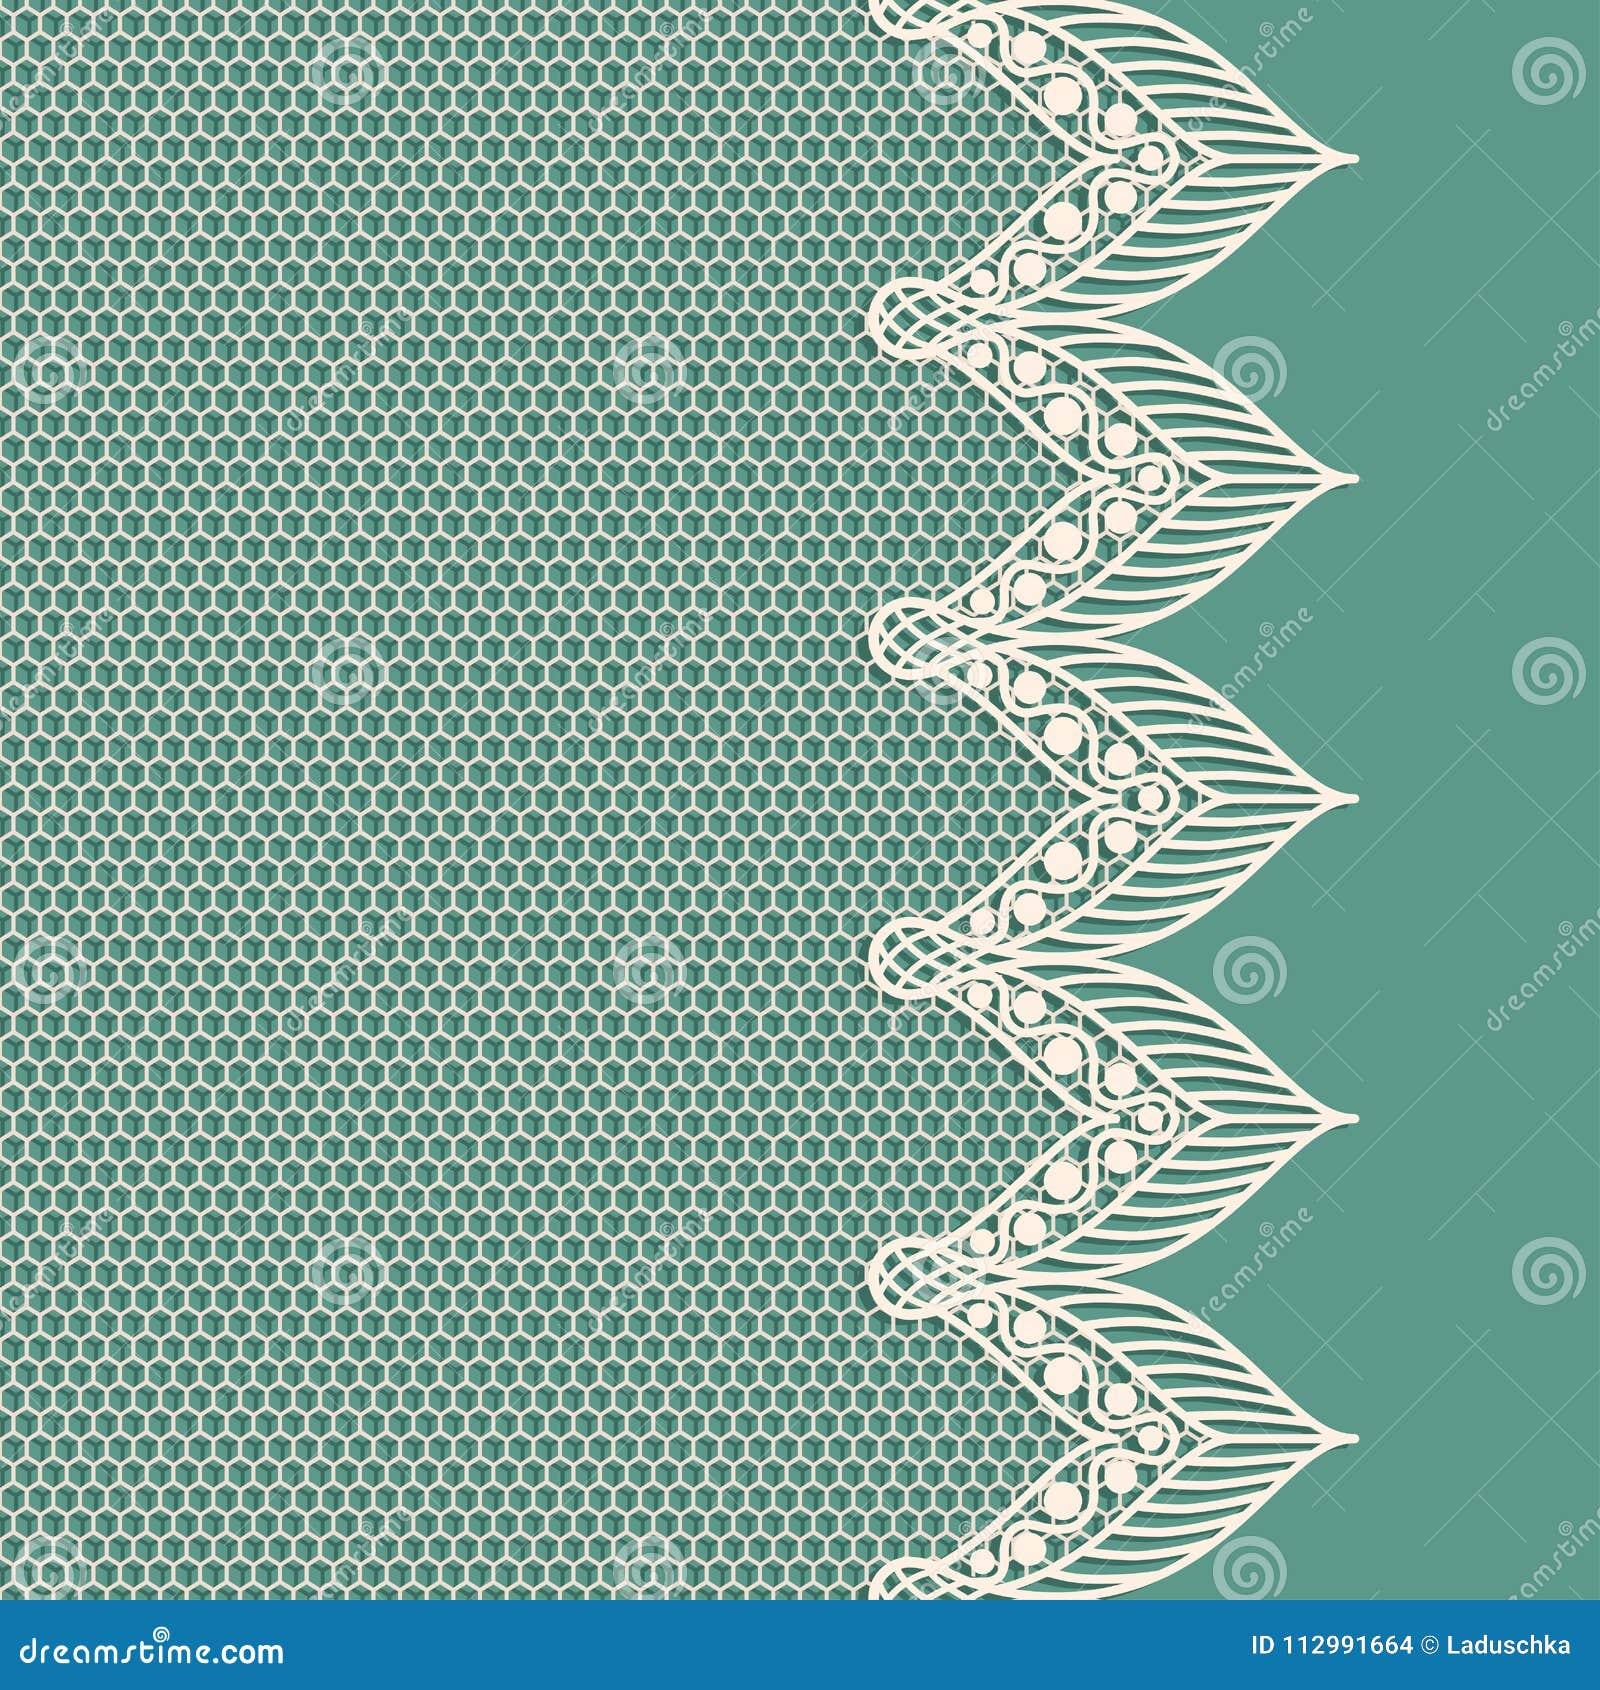 Vintage lacy border